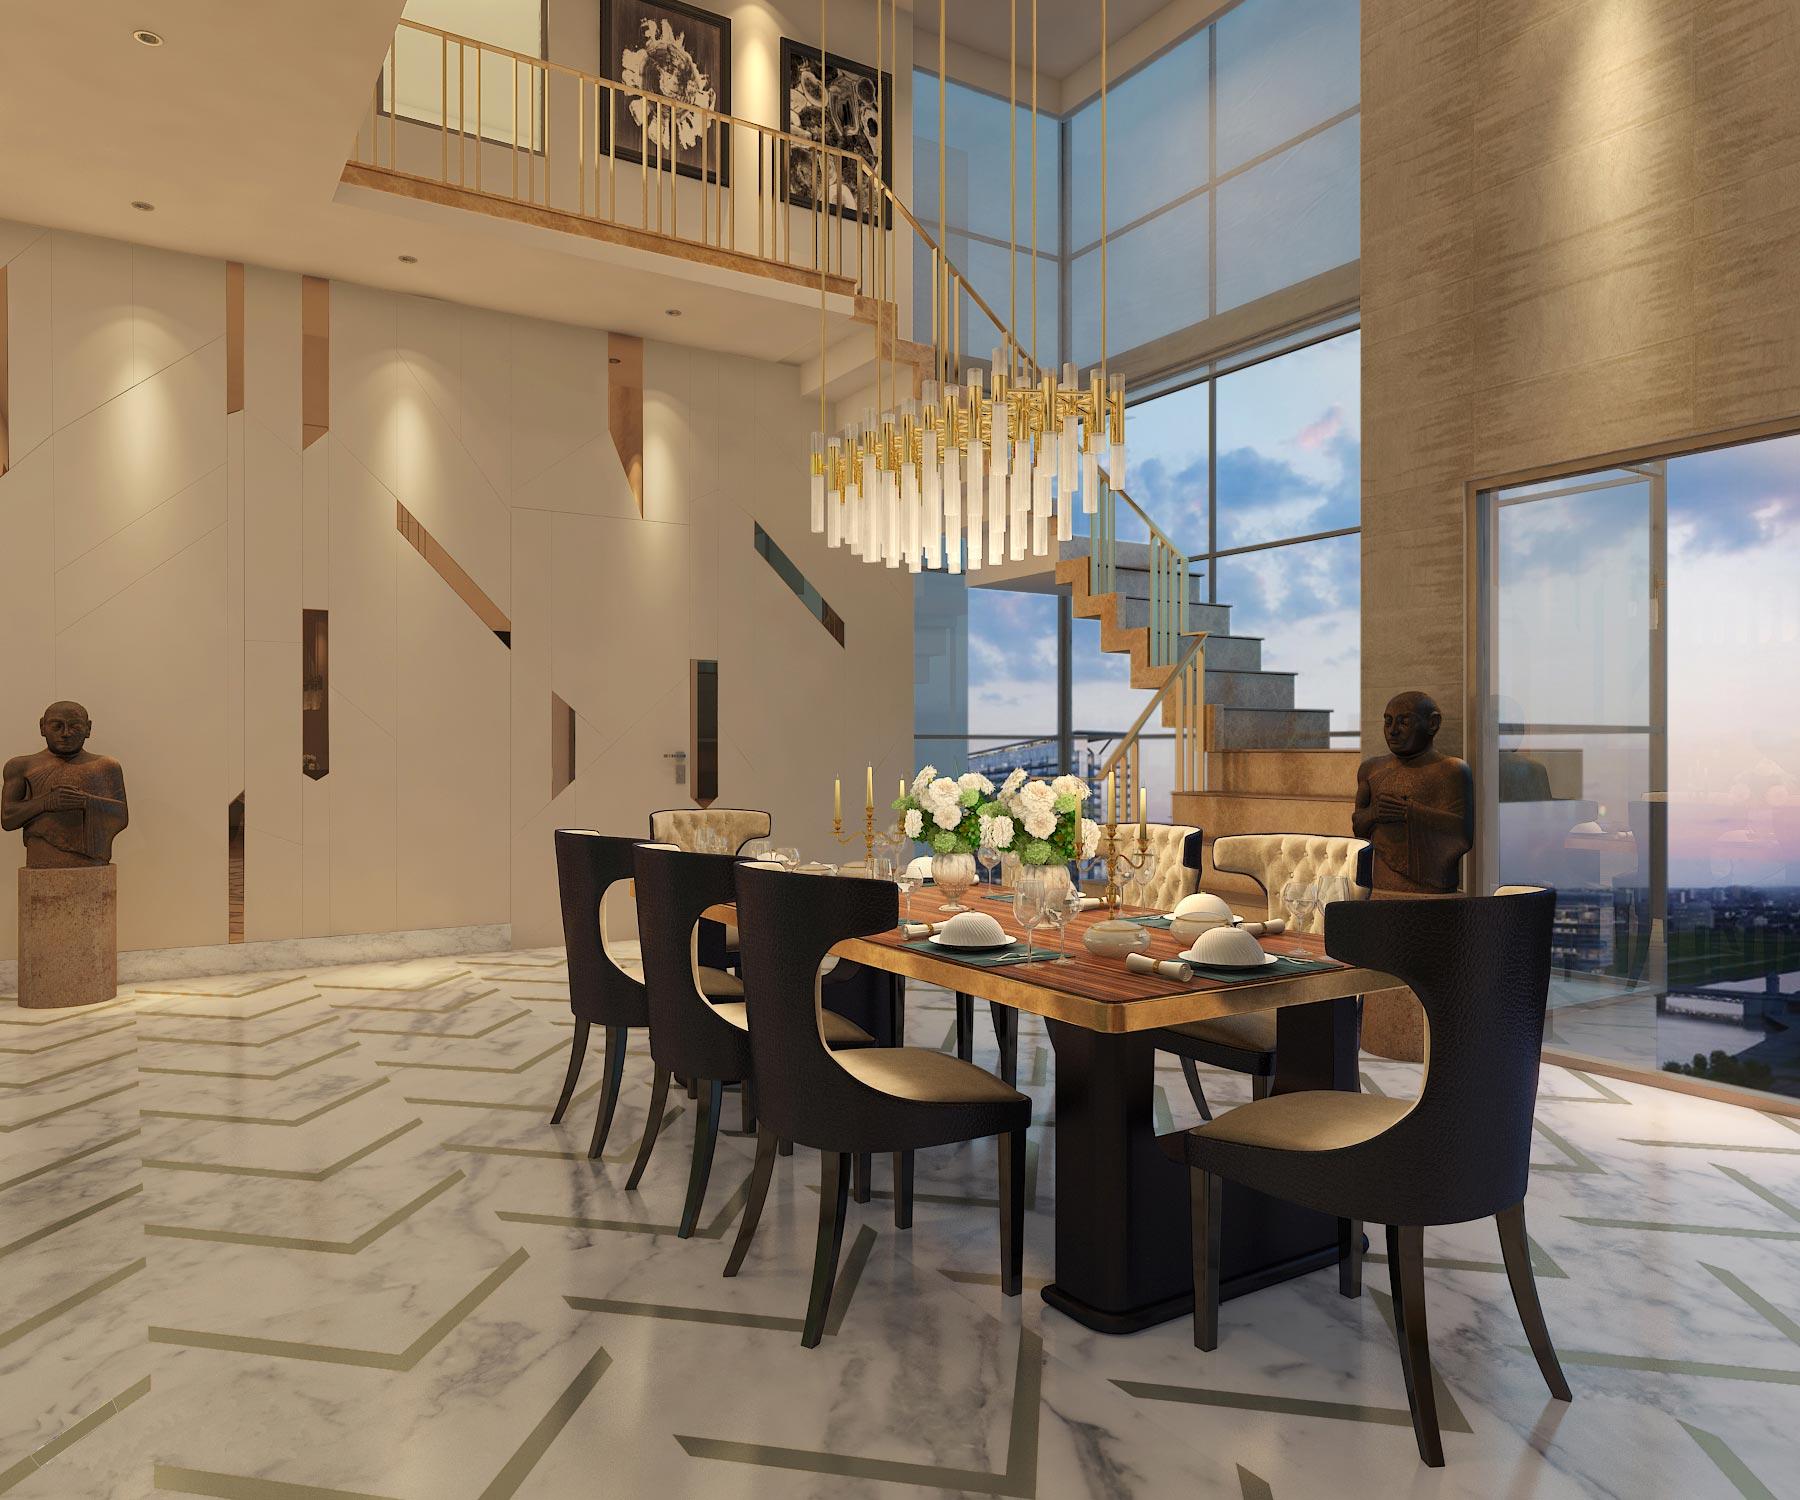 Bungalow Interior Design Kitchen: Synthesis – Architecture